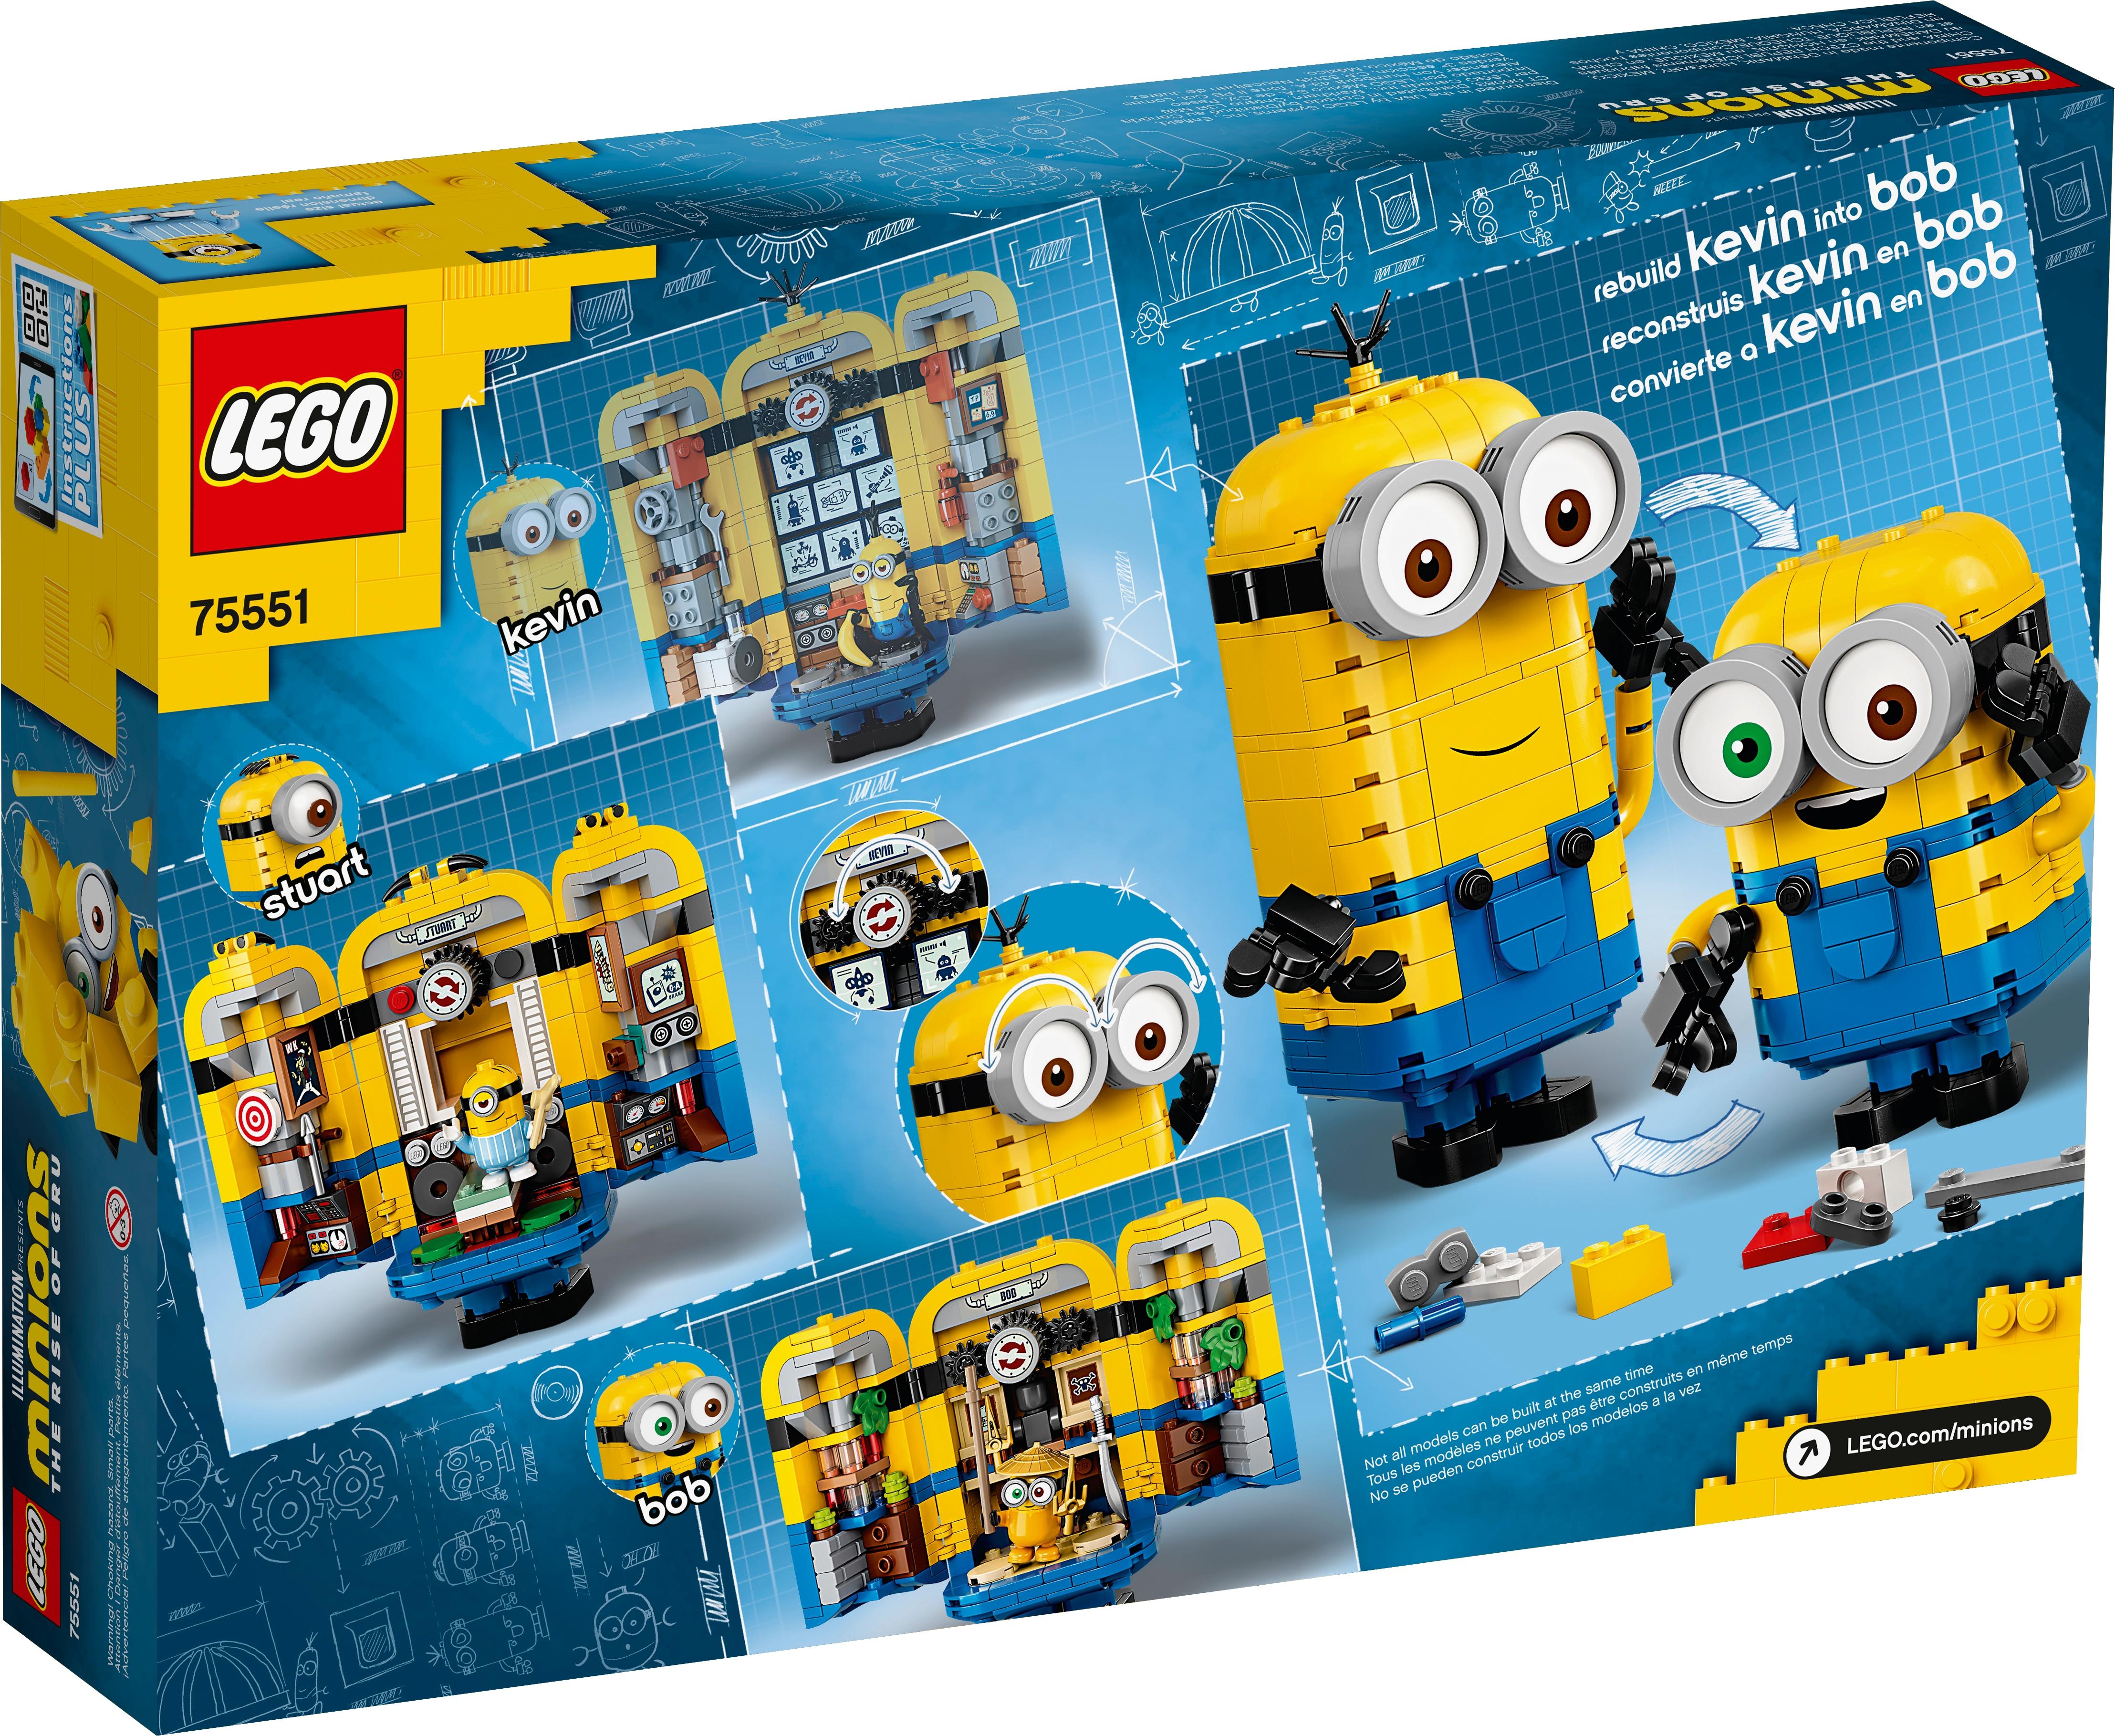 LEGO Minions Brand New Boxed Free Postage! Brick-built Minions /& Lair 75551